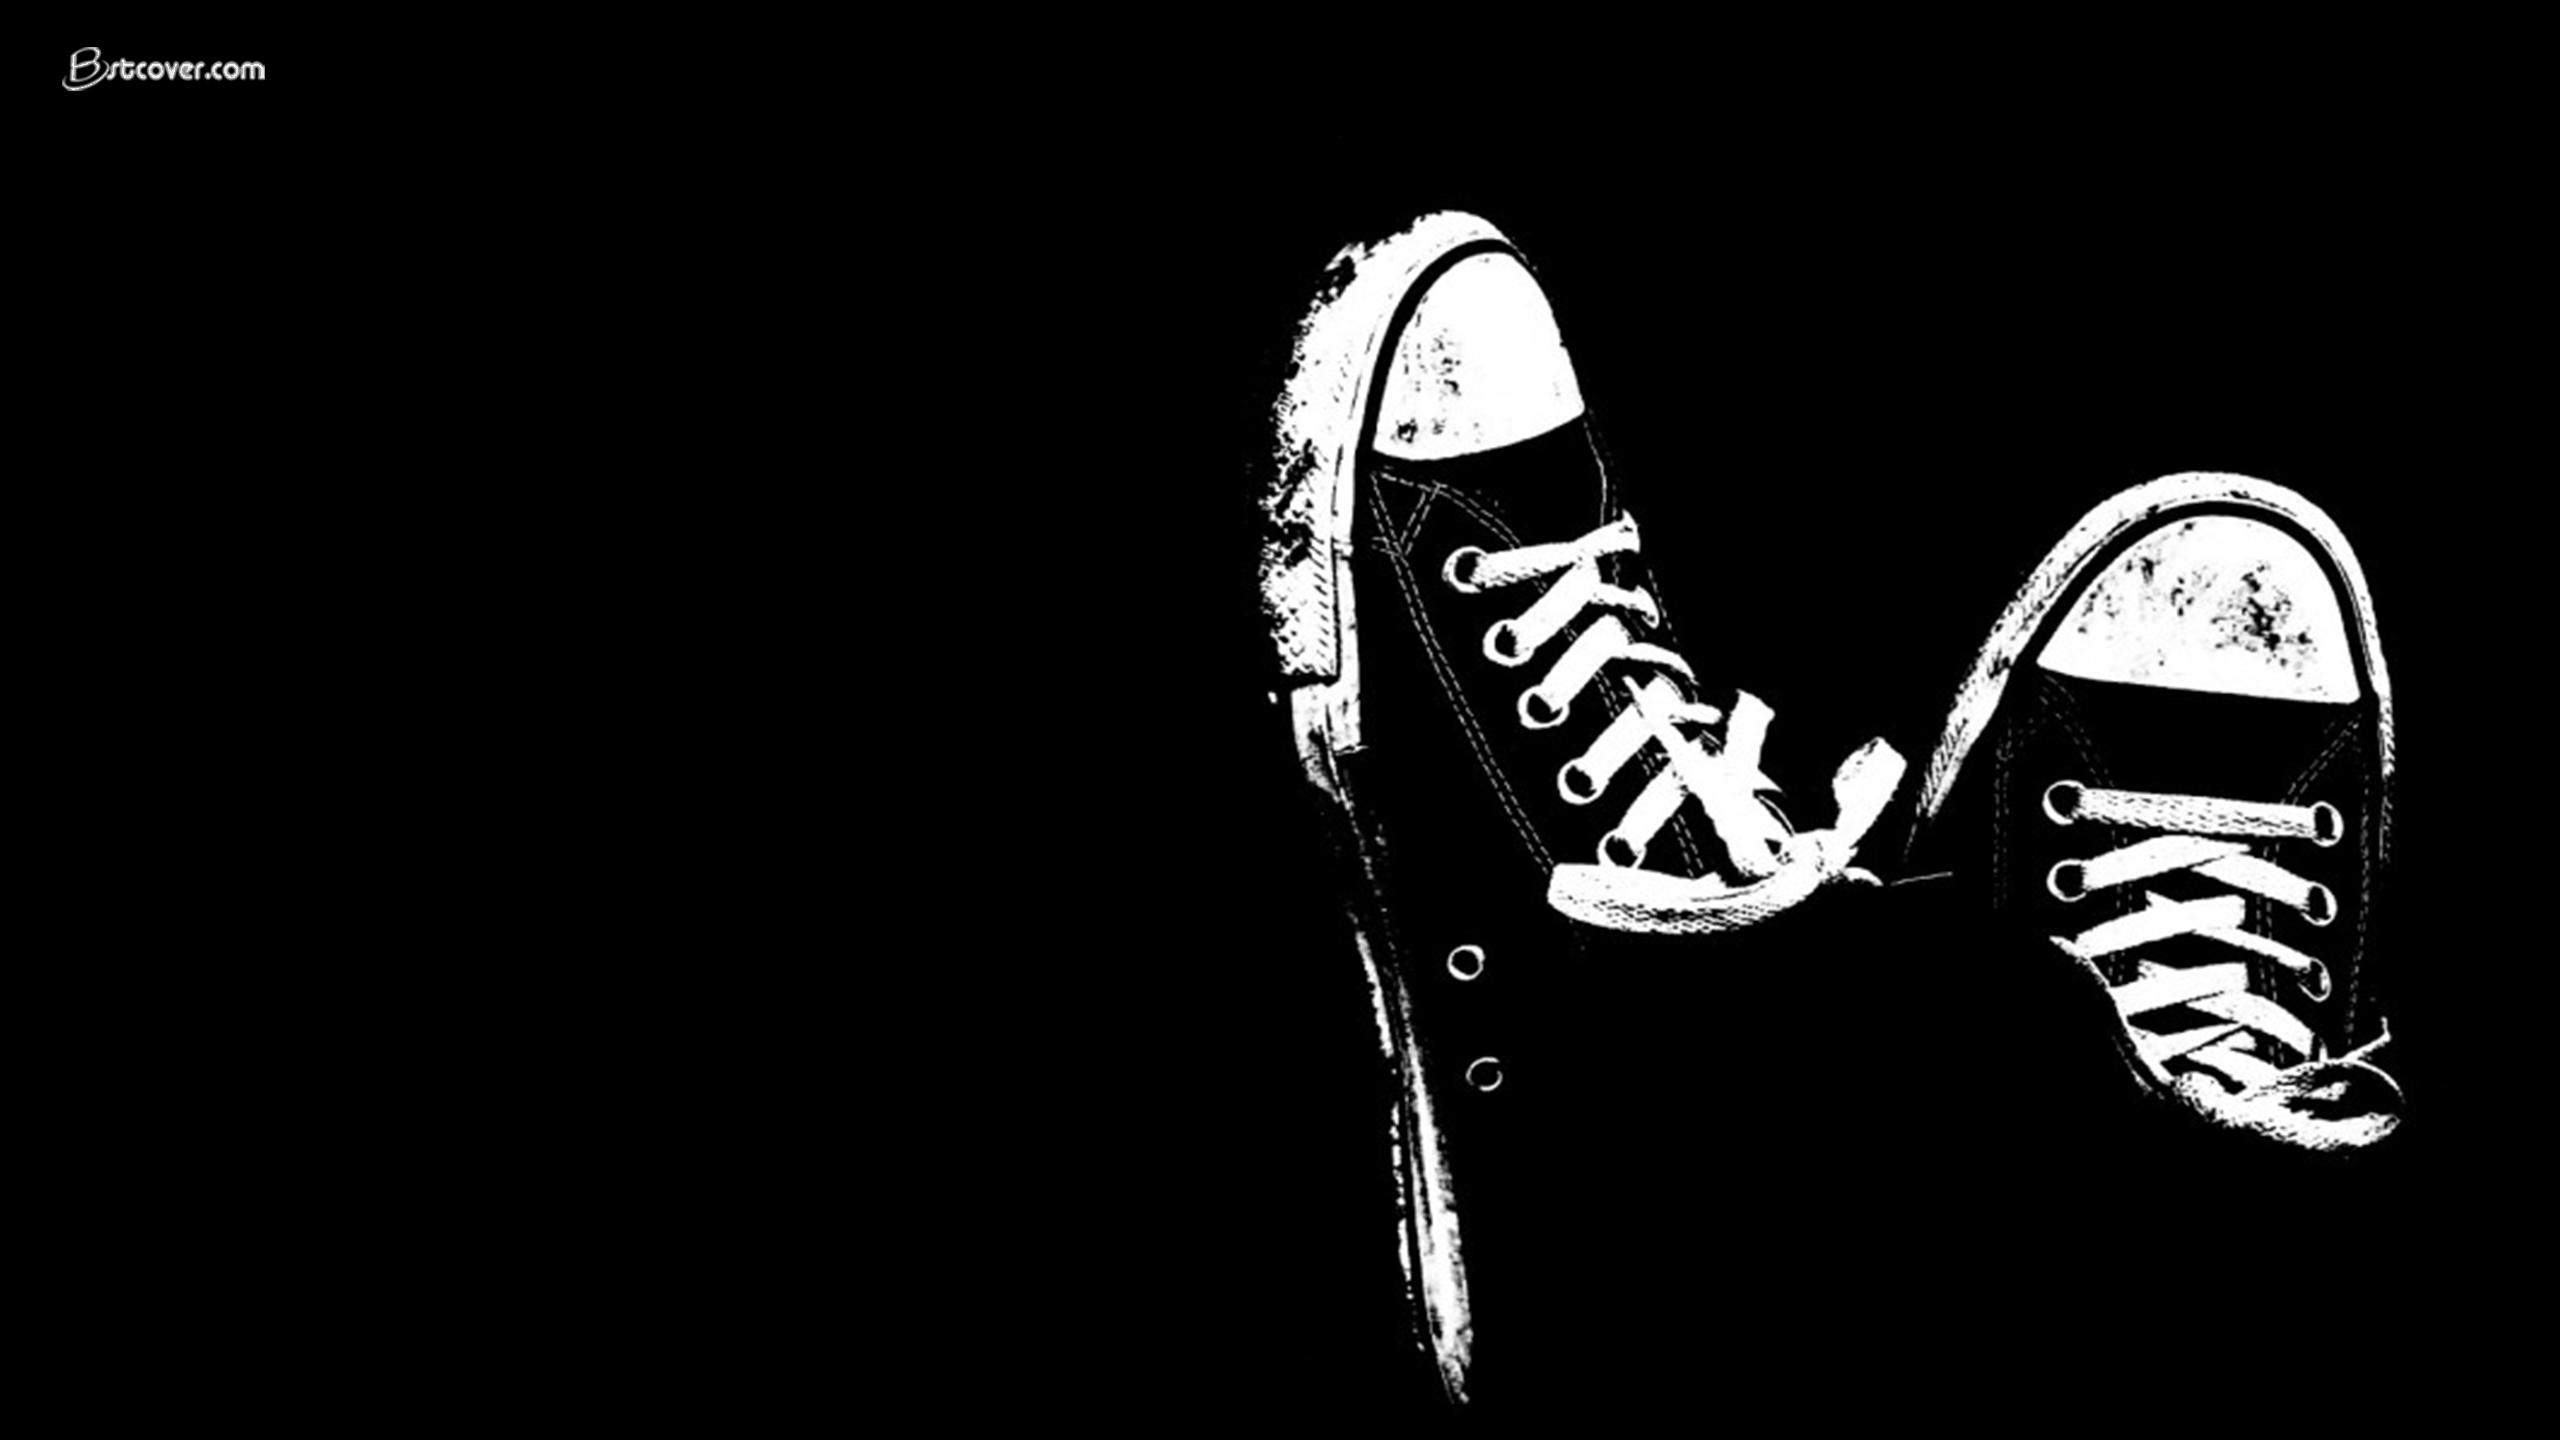 background cover photos youtube wallpape white black wallpaper 2560x1440